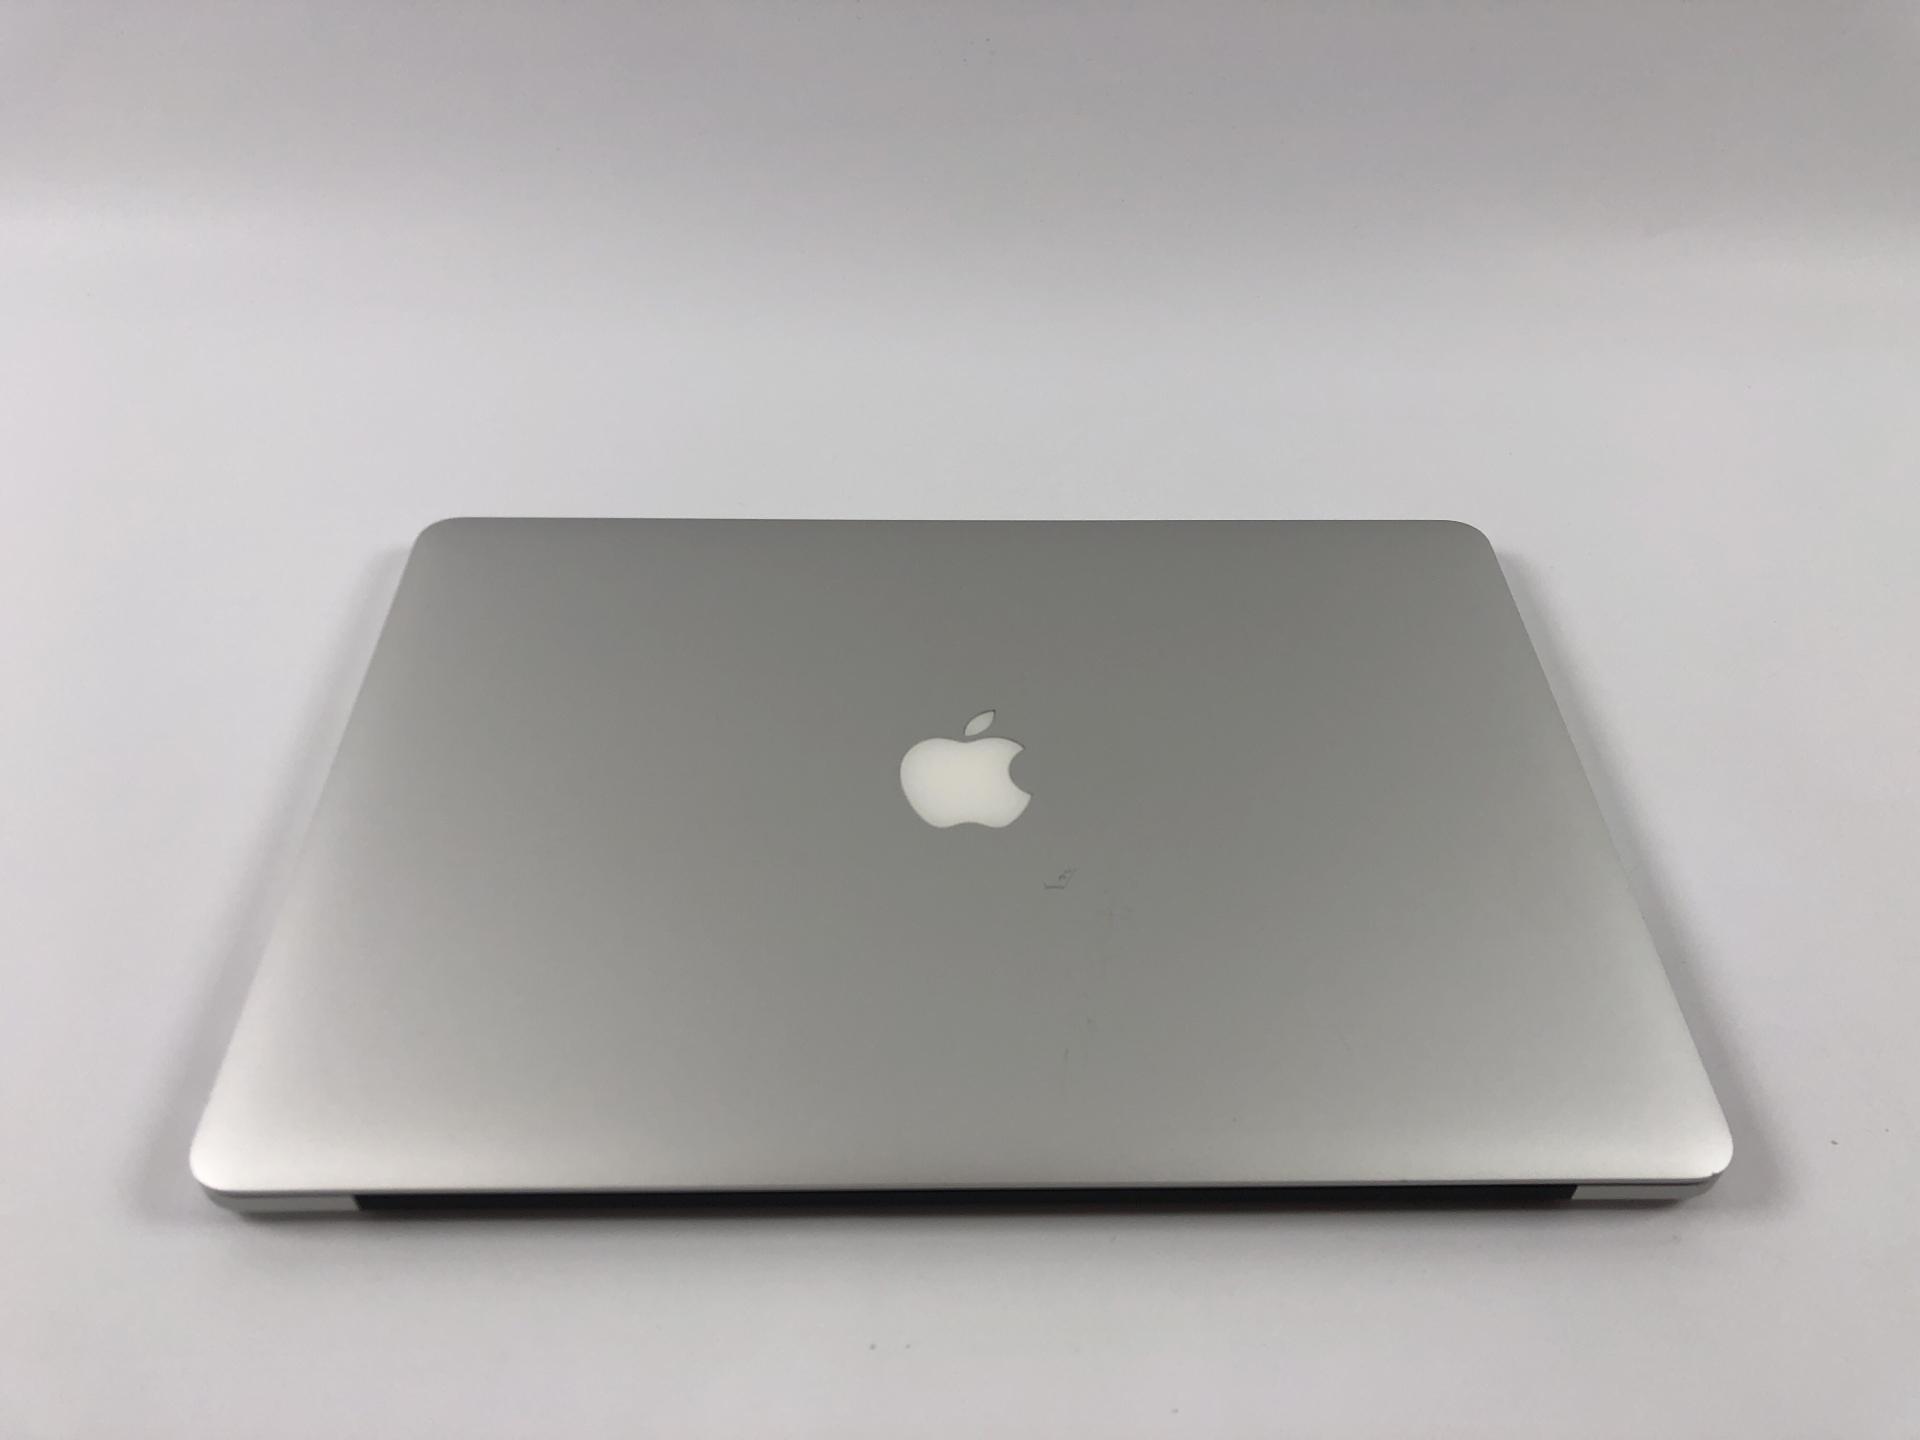 "MacBook Pro Retina 15"" Late 2013 (Intel Quad-Core i7 2.0 GHz 8 GB RAM 256 GB SSD), Intel Quad-Core i7 2.0 GHz, 8 GB RAM, 256 GB SSD, Kuva 2"